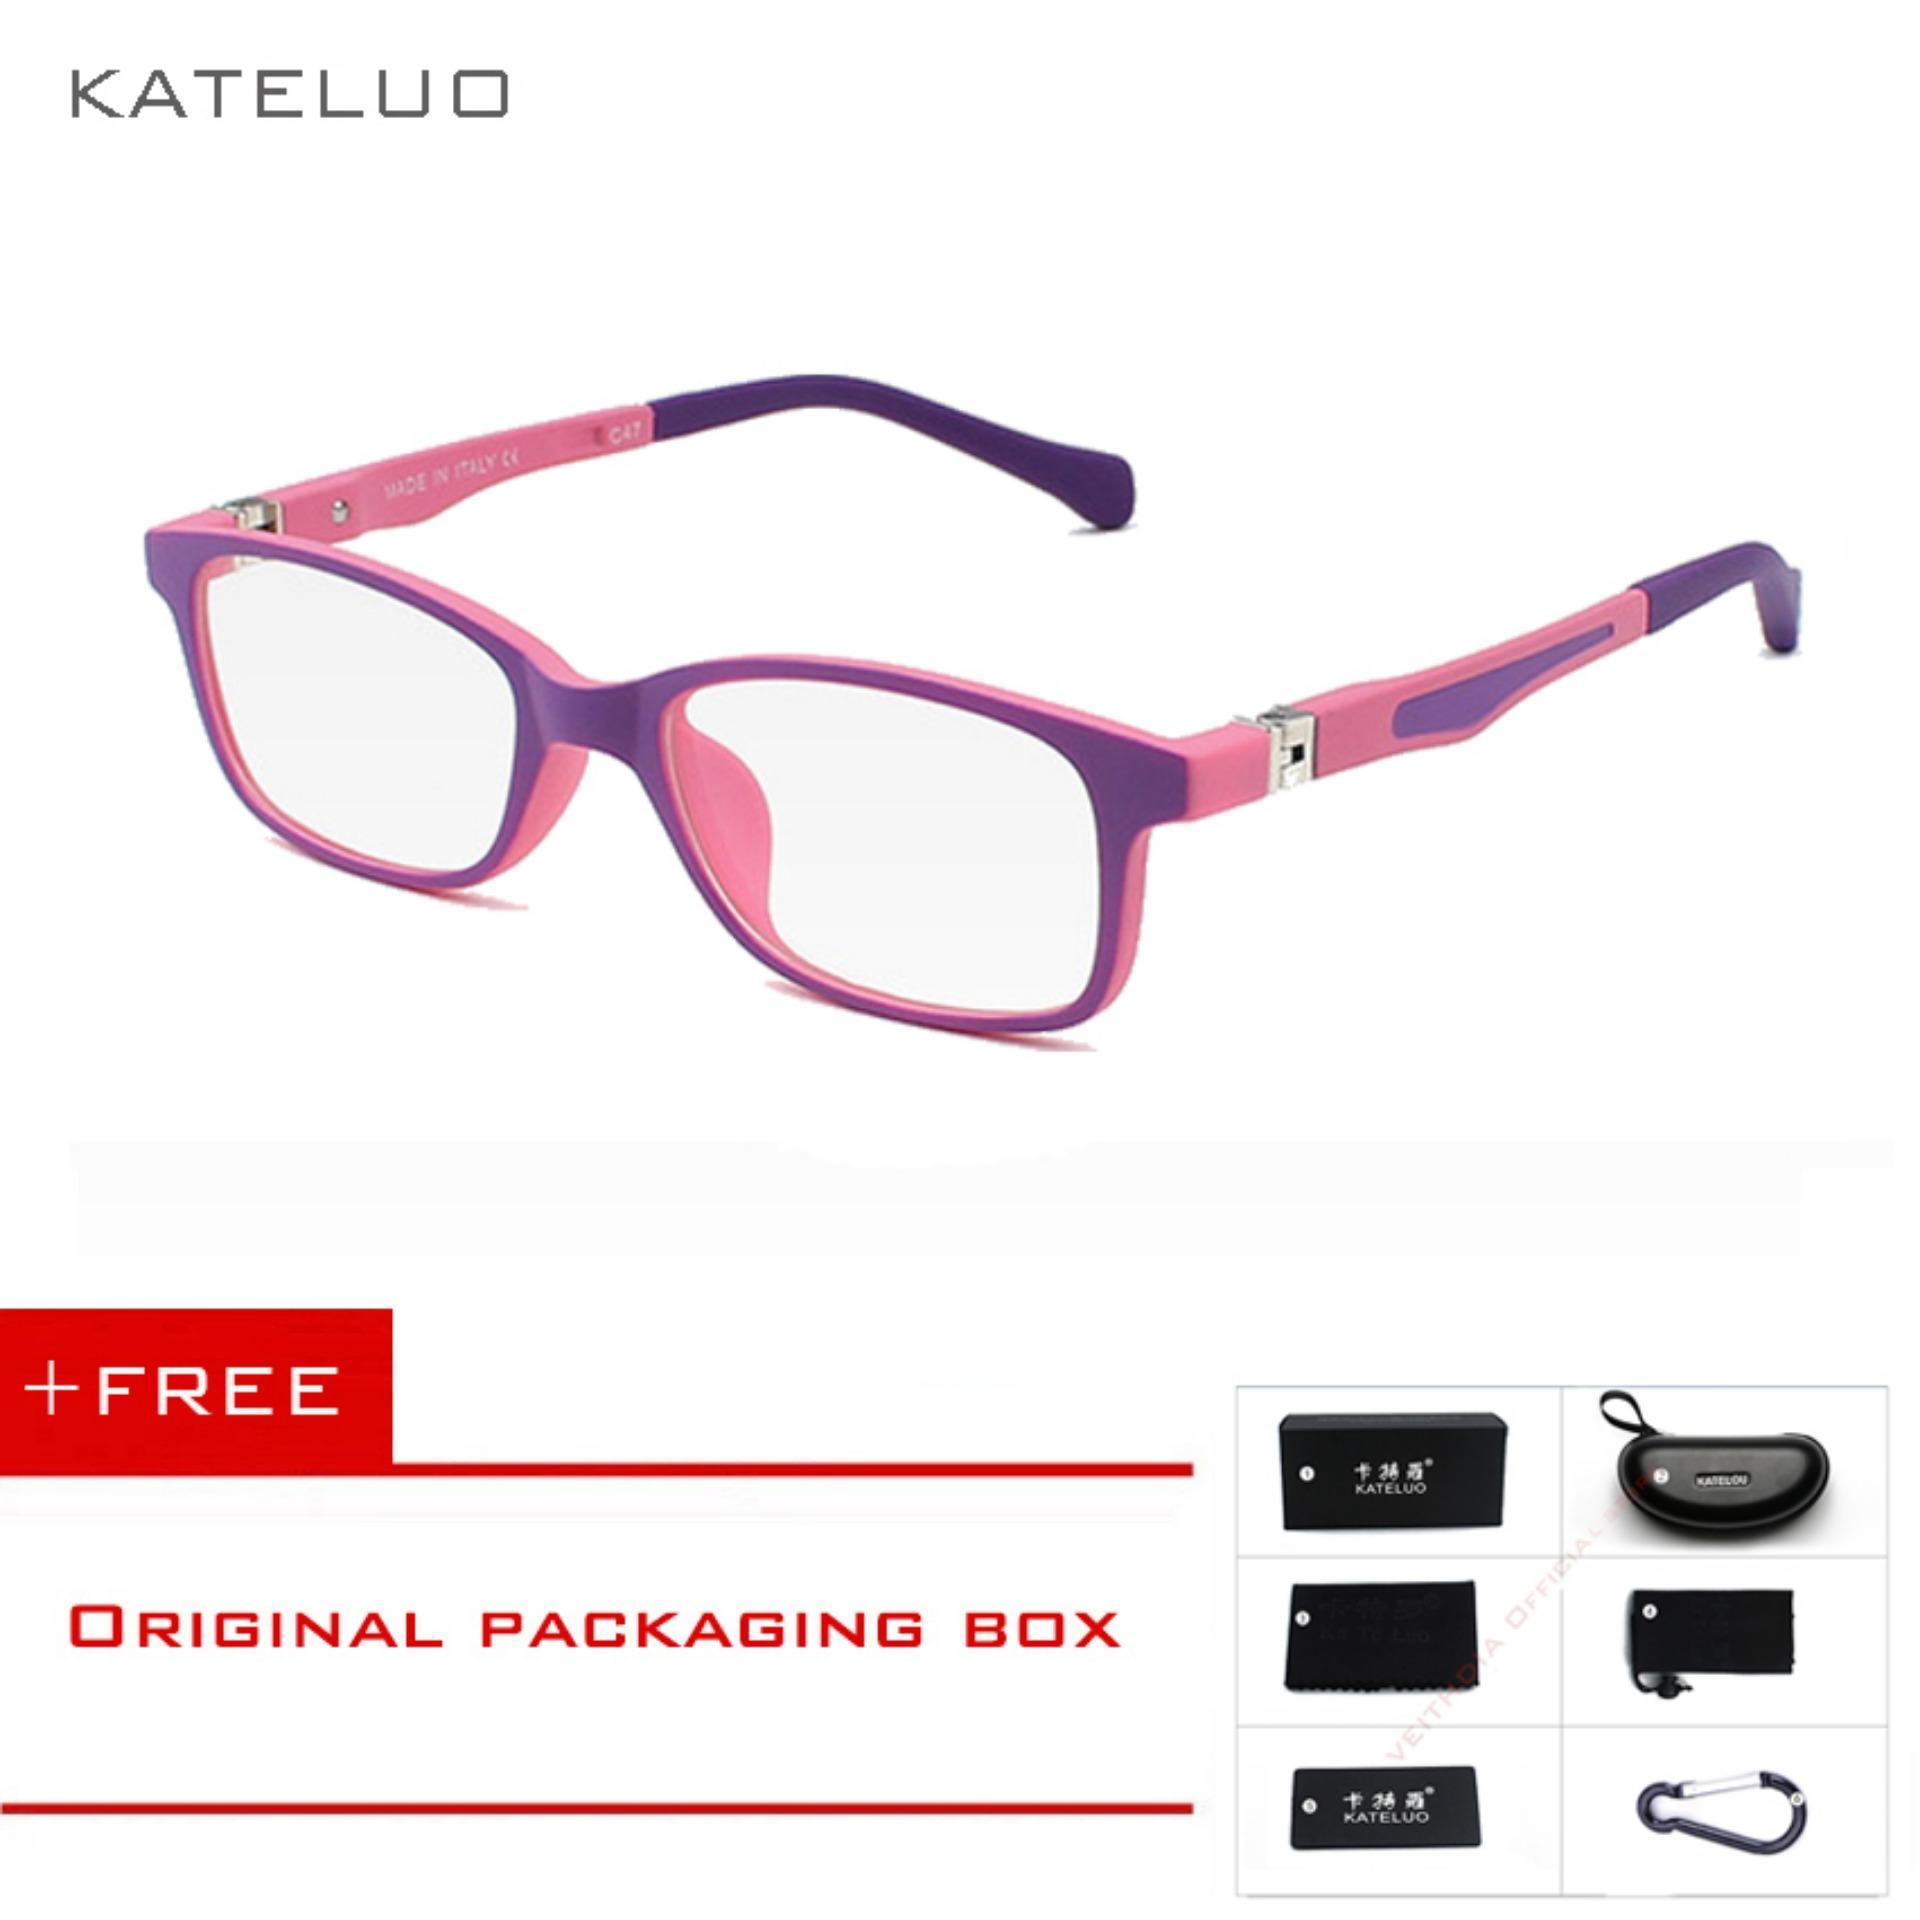 eaae4a9839 Singapore. KATELUO Children Anti Computer Blue Kids Eyeglasses Glasses Frame  1021